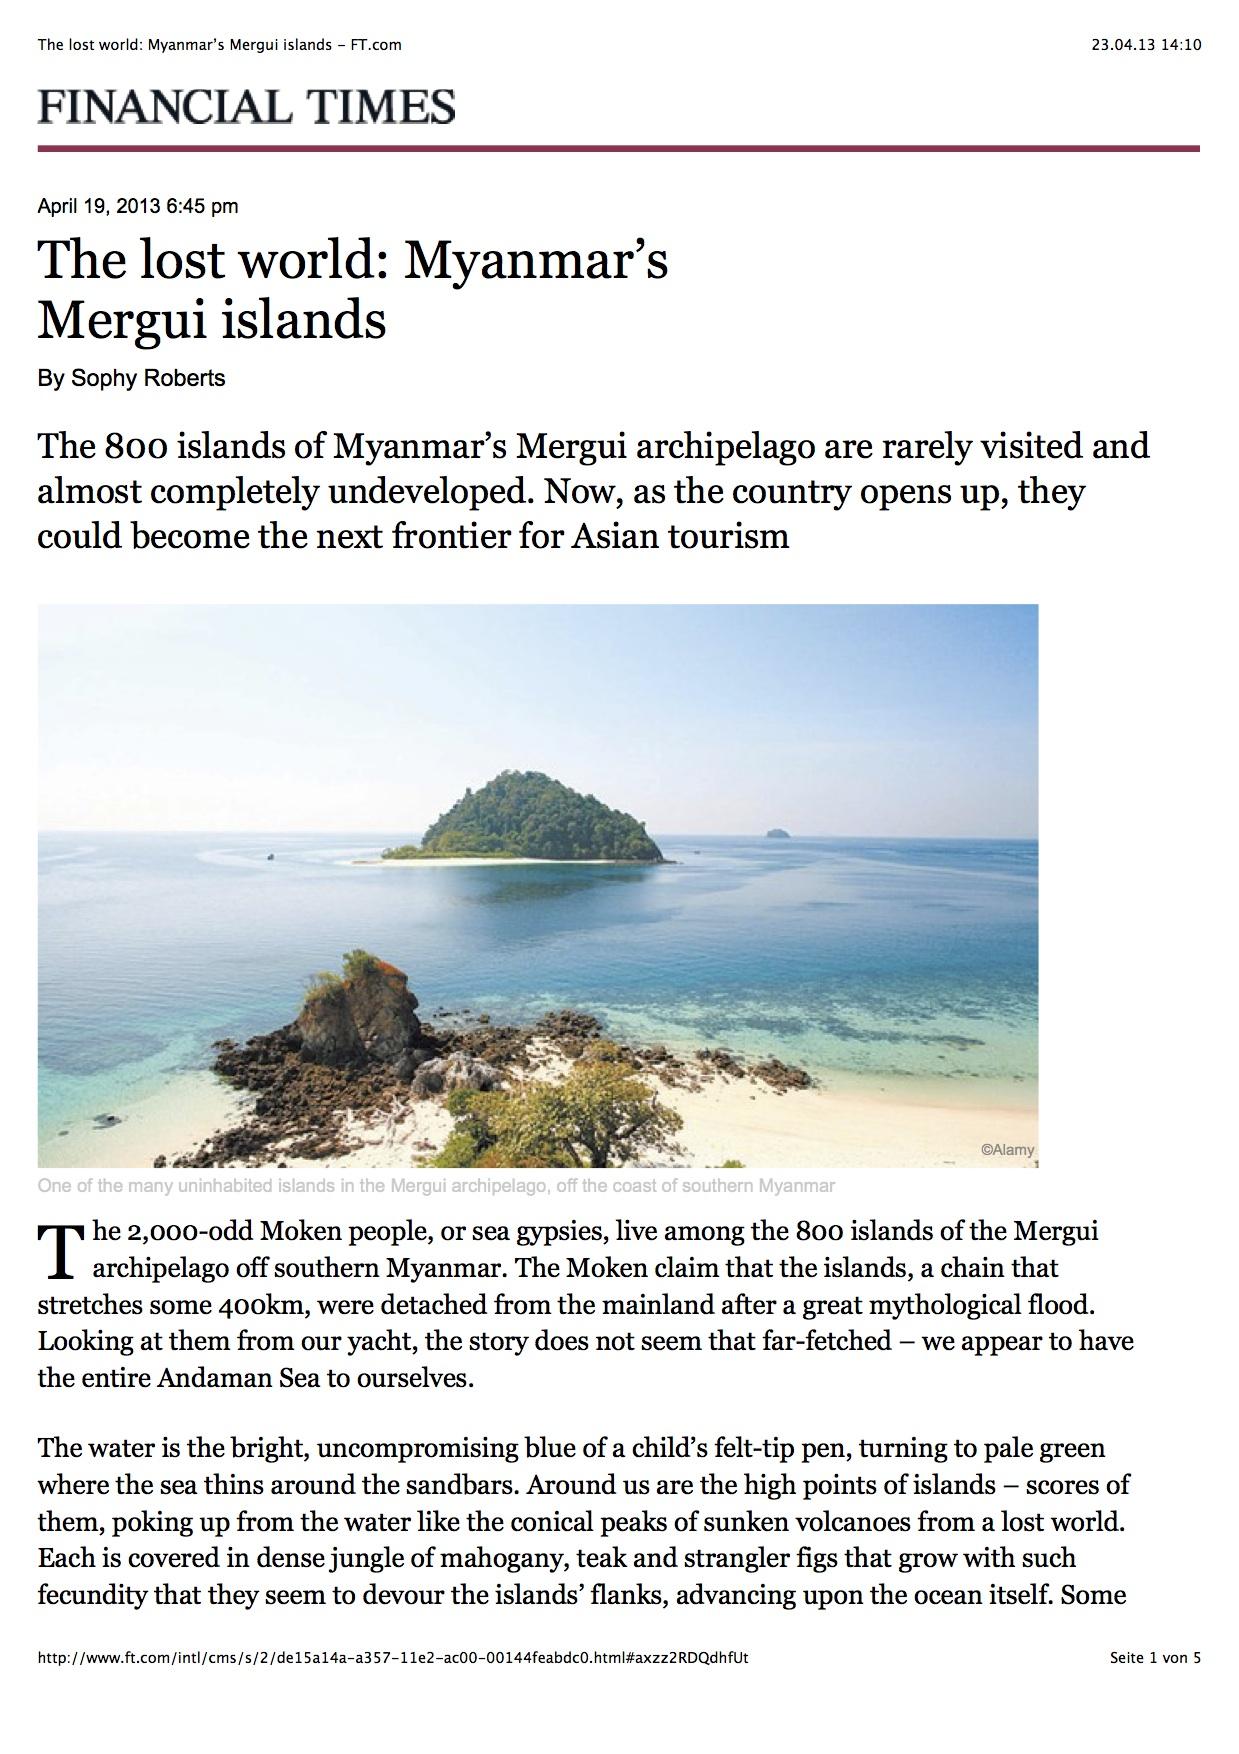 Myanmar's Moken people in the Mergui island world